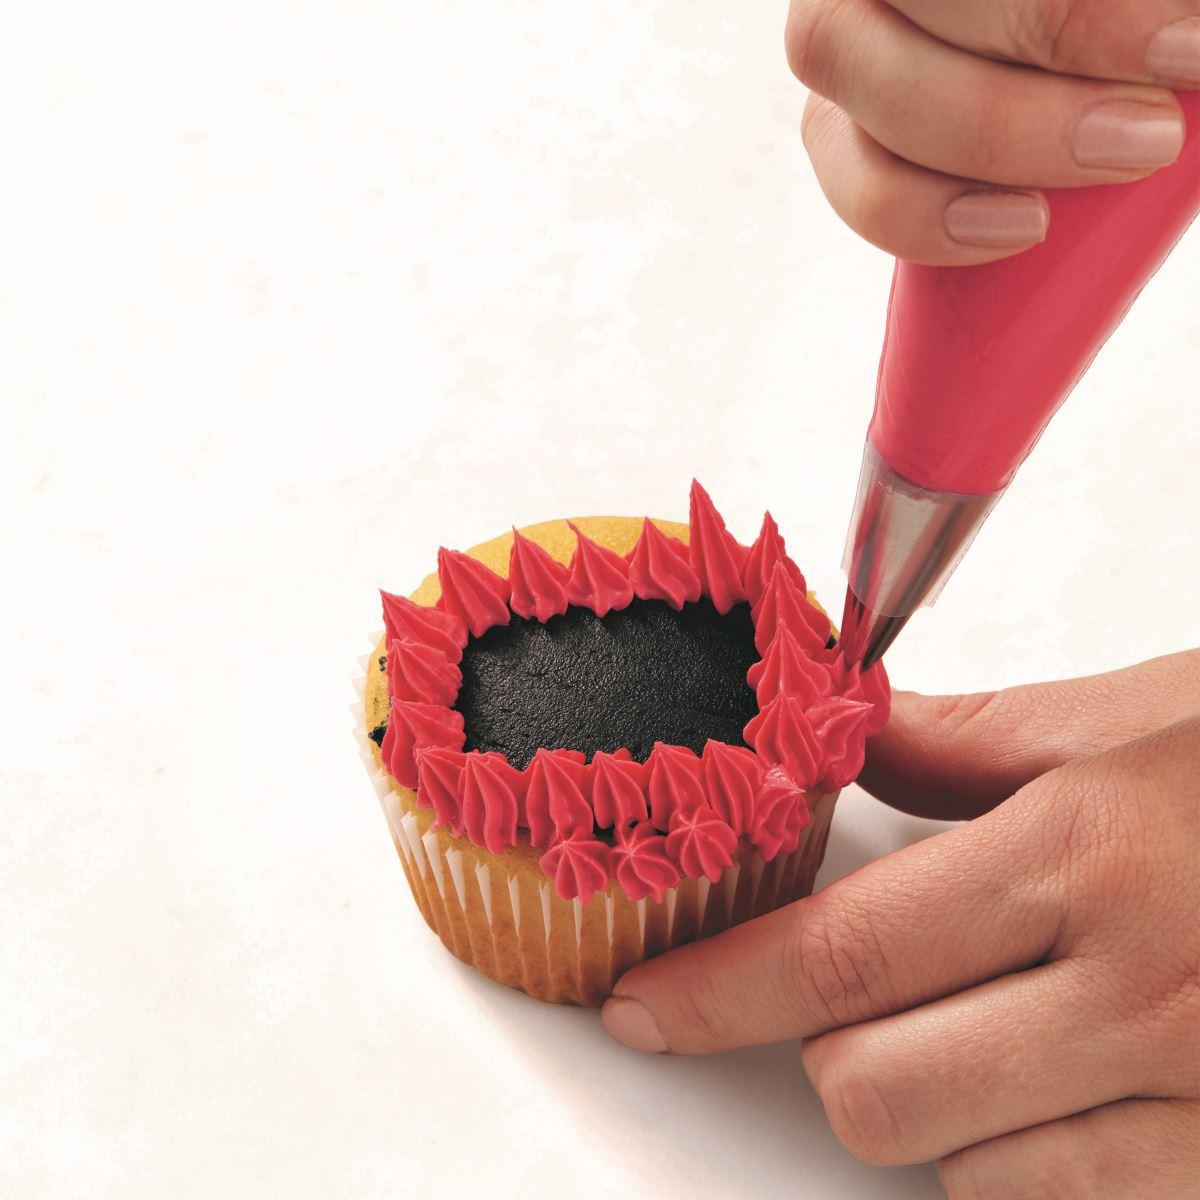 PINK ONE-EYED MONSTER CUPCAKE step 2